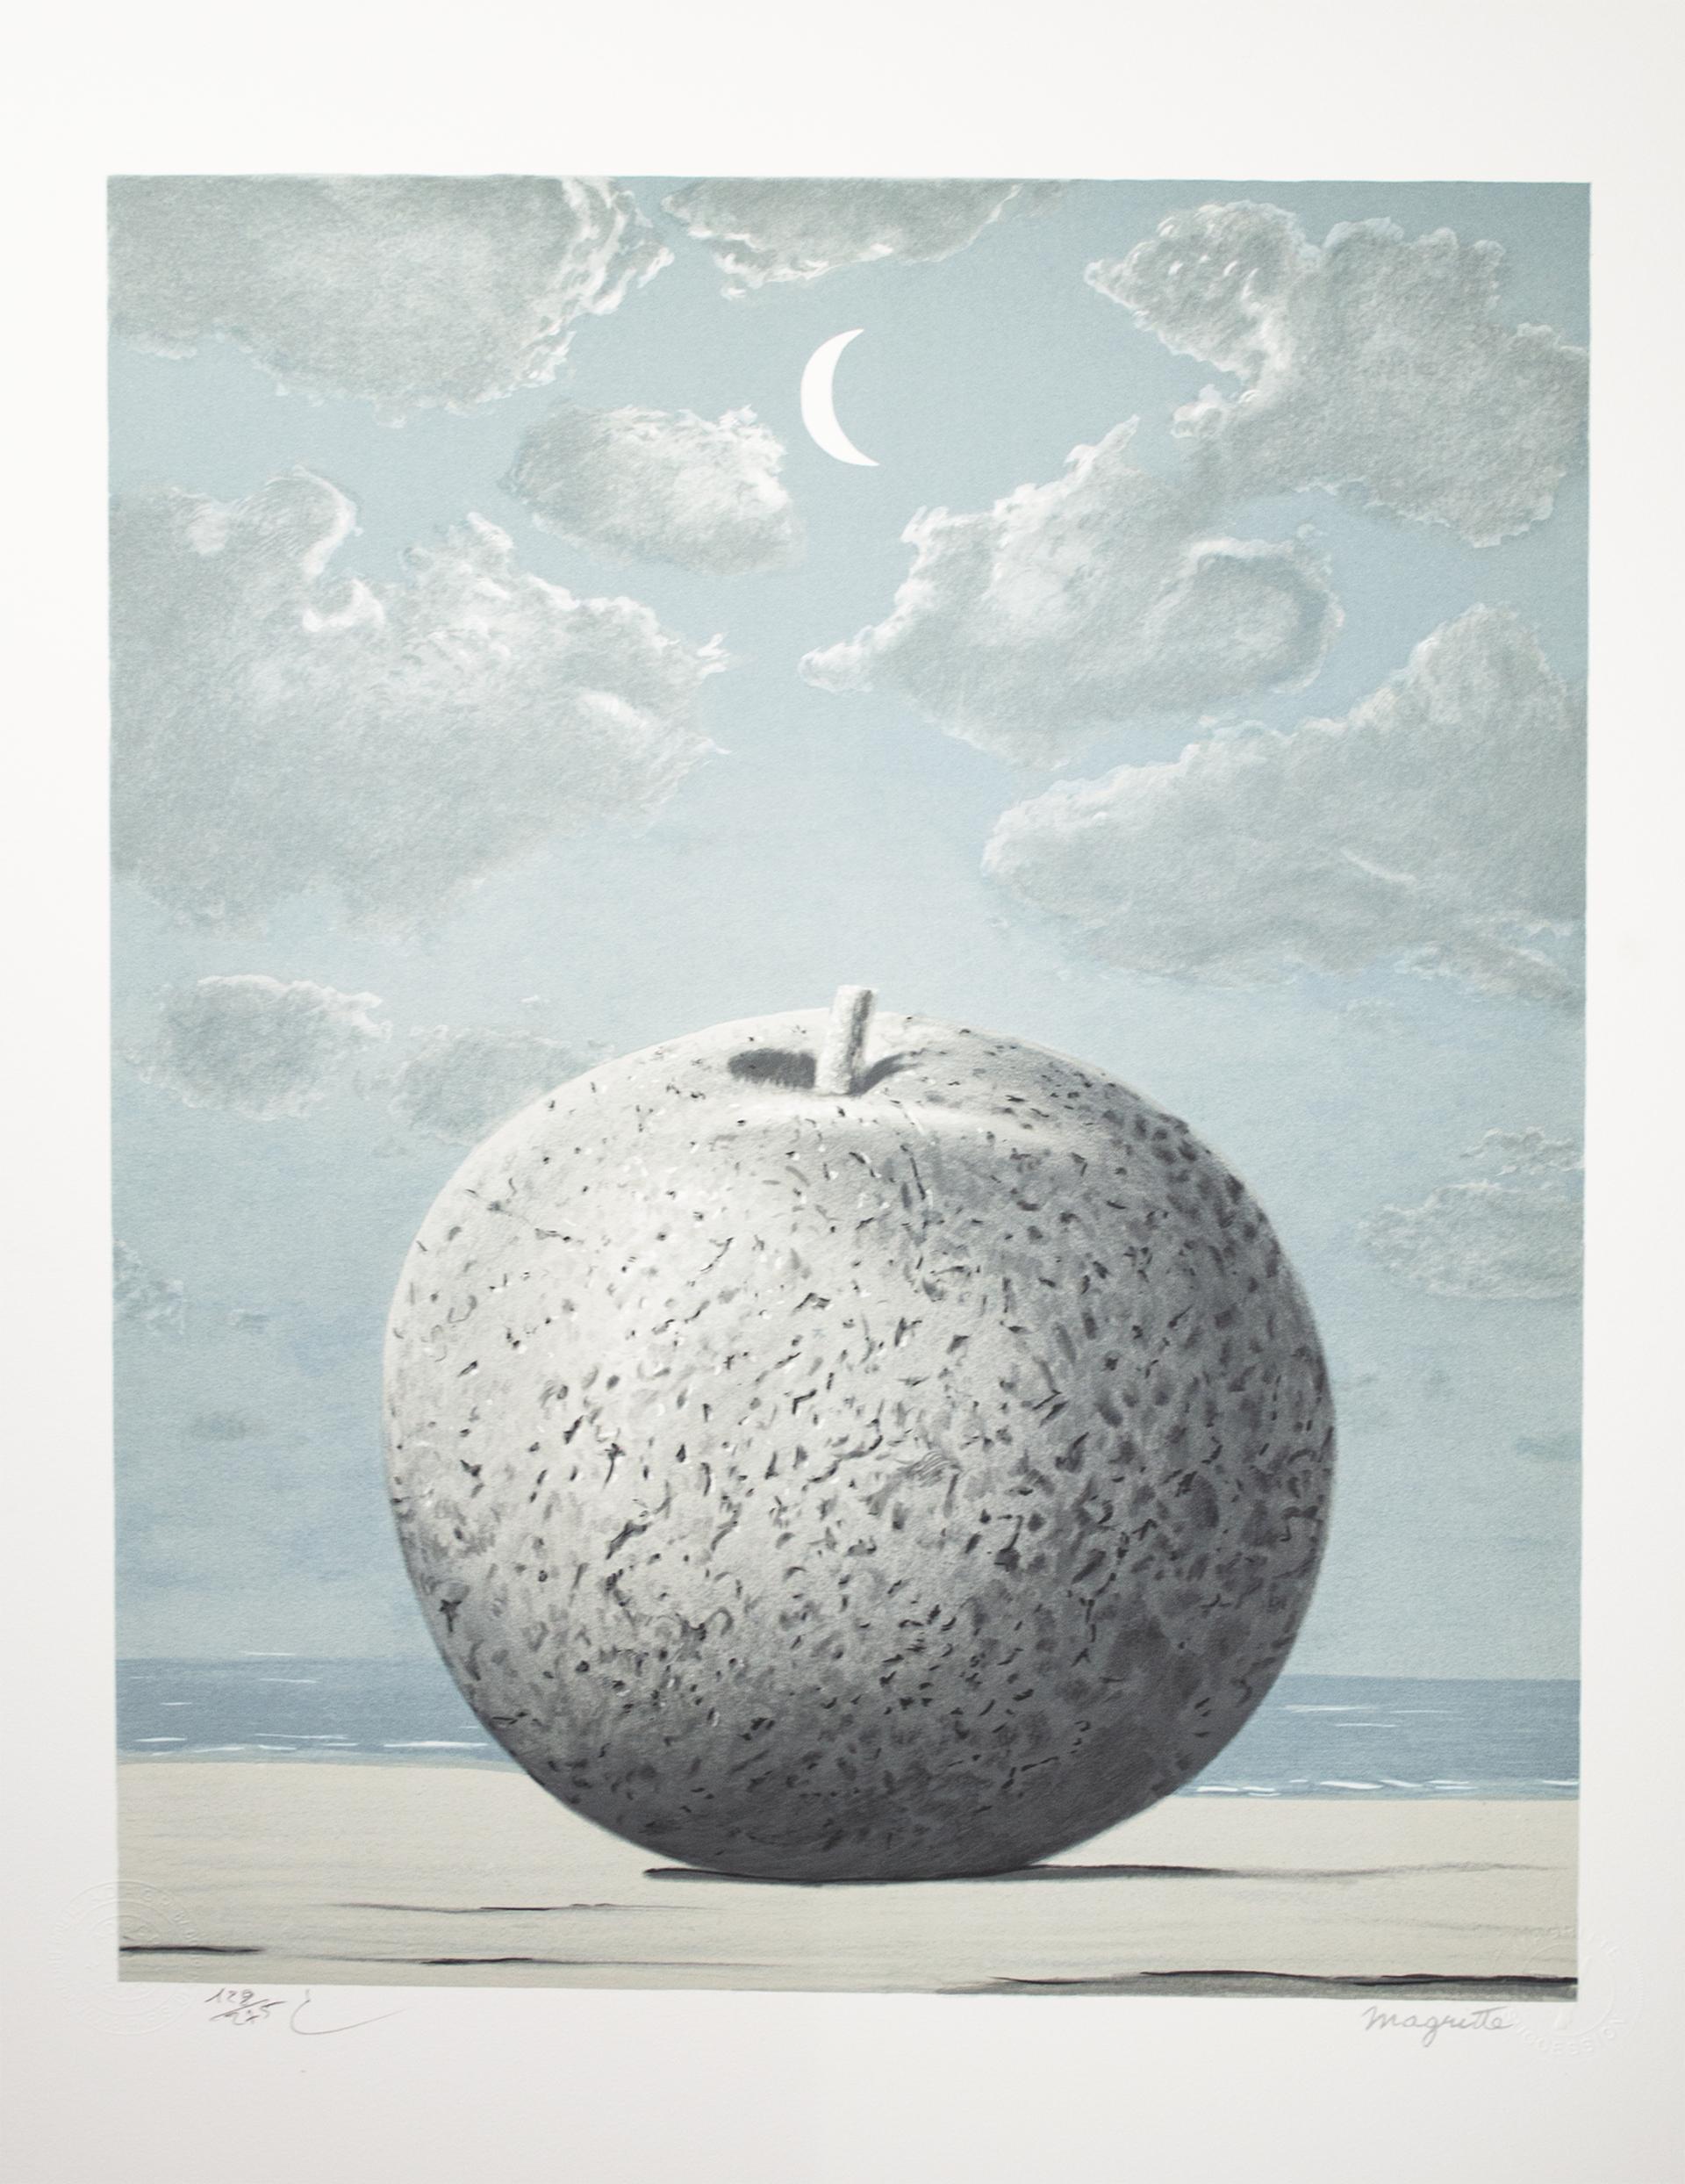 Souvenir de voyage (Memory of a Journey) by Rene Magritte